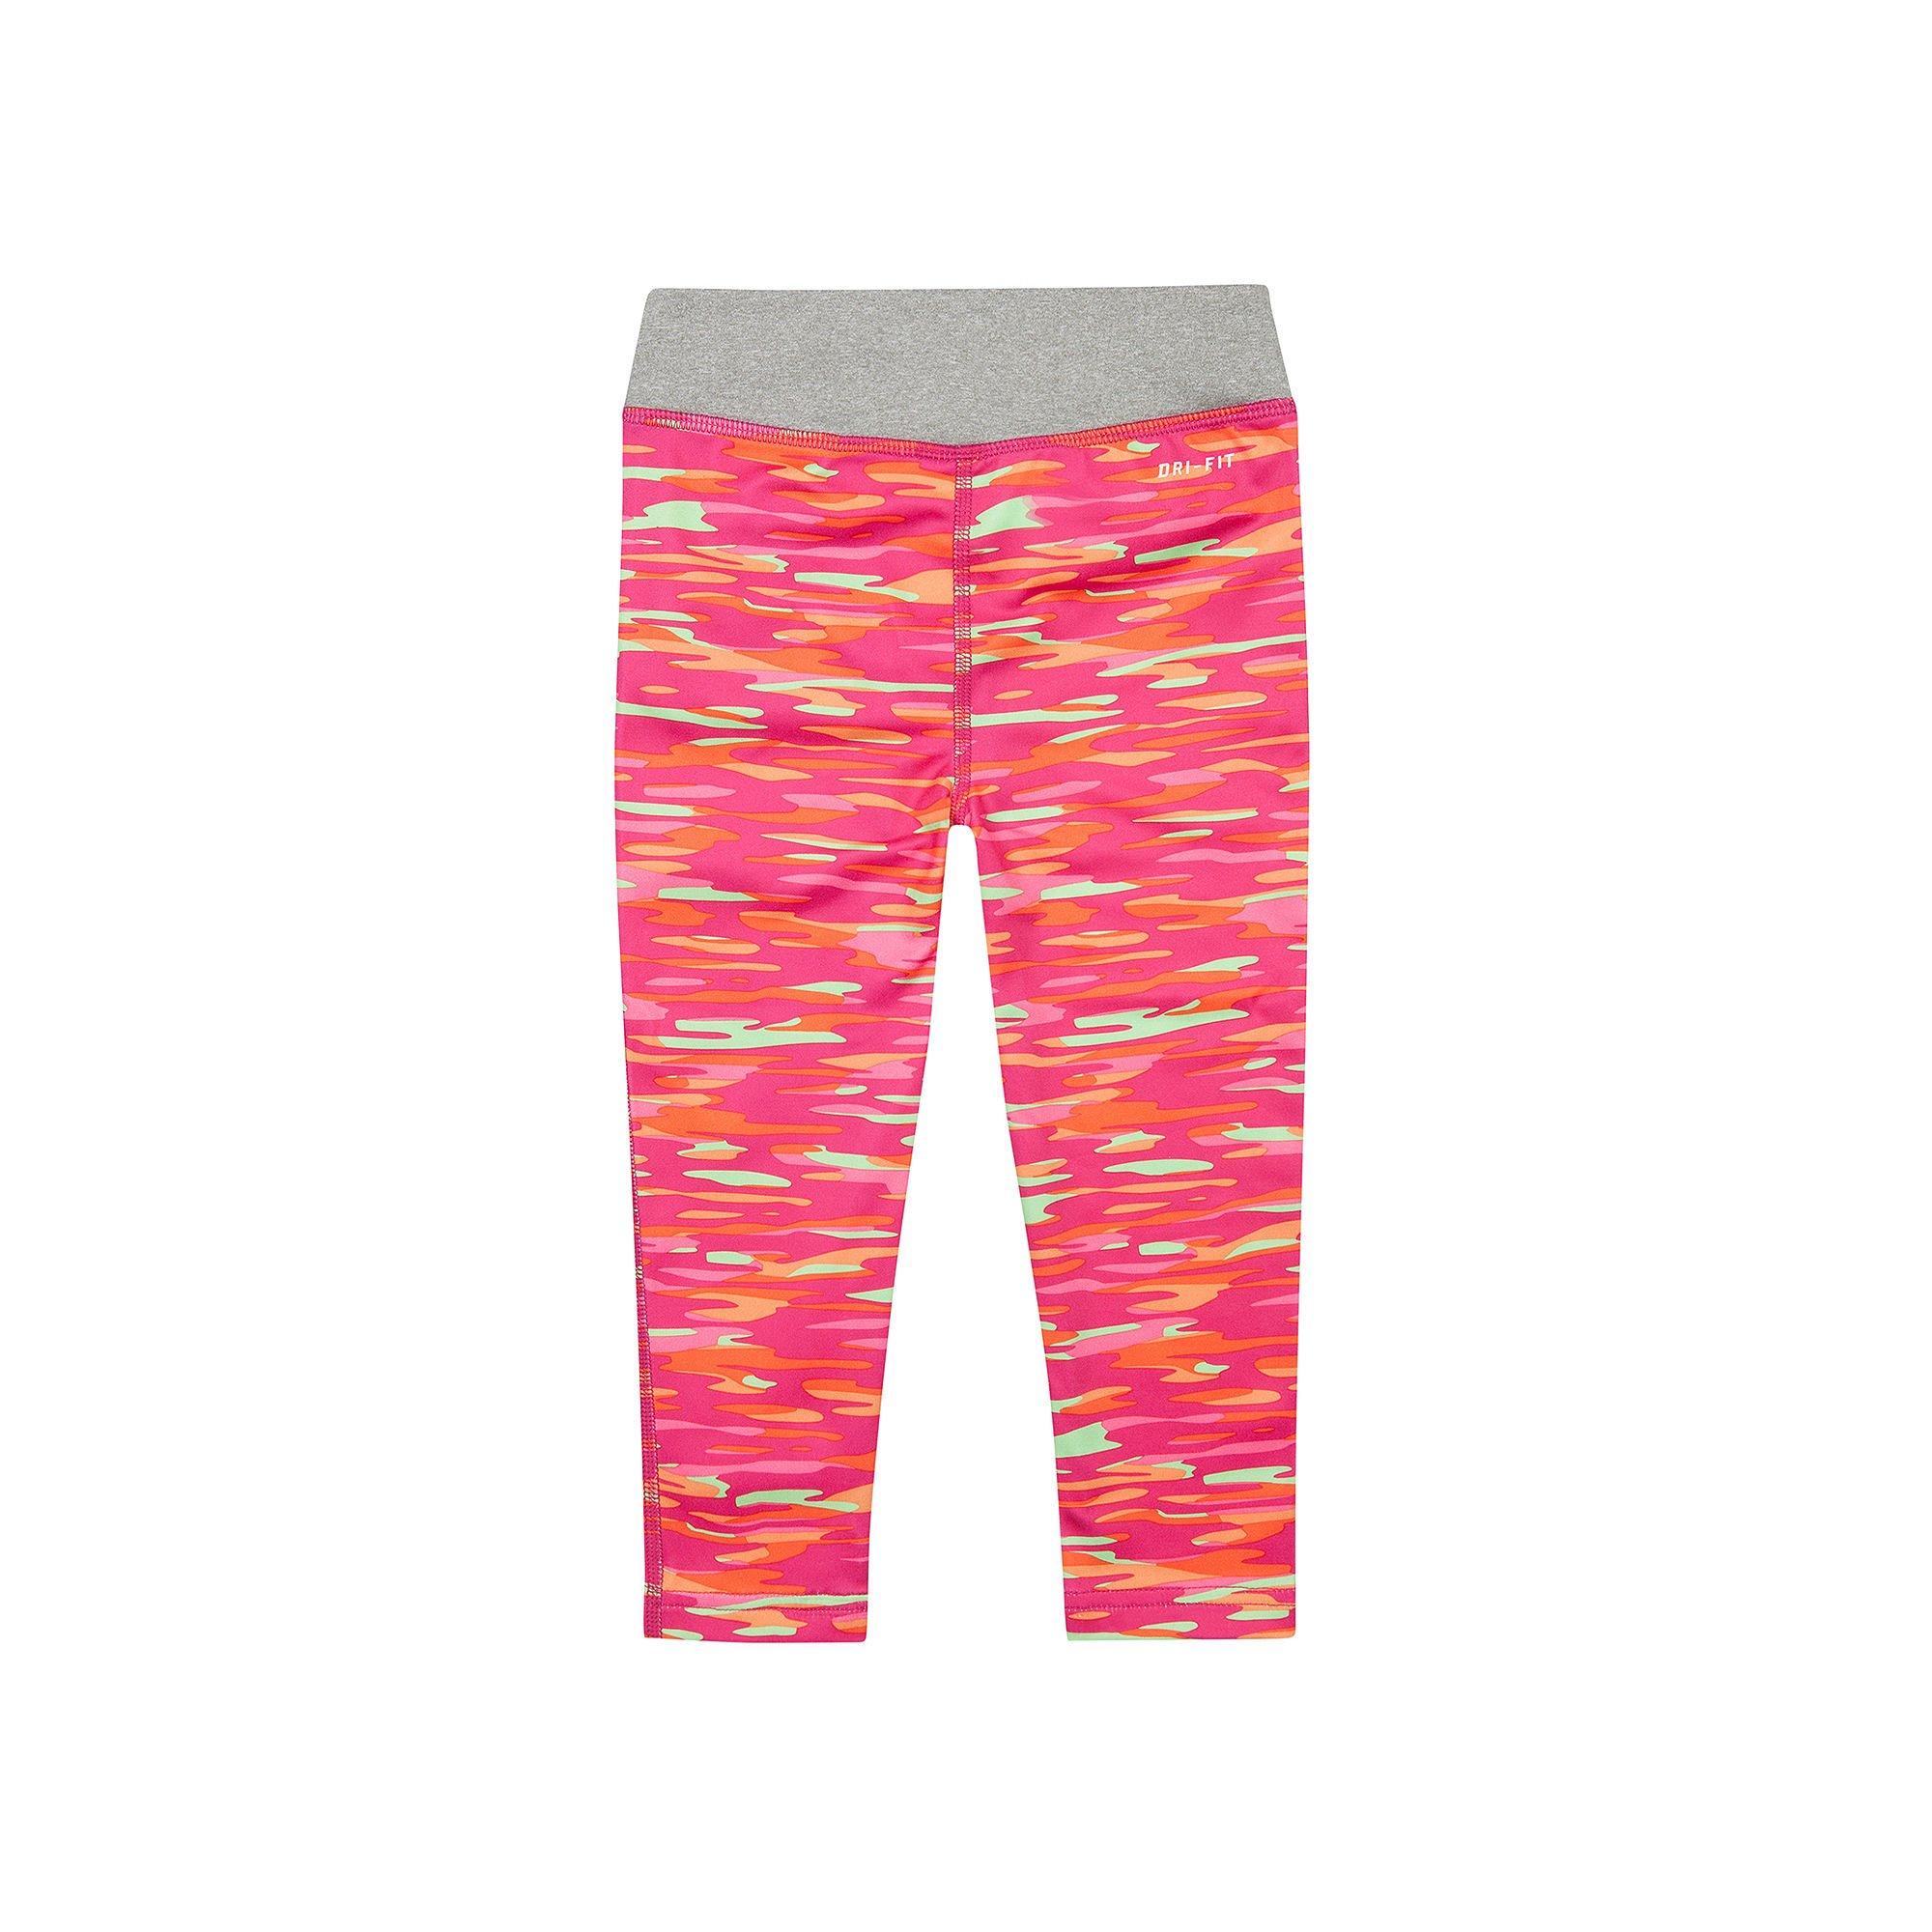 dc3bacc78060ff Galleon - Nike Little Girls' (4-6X) Dri-Fit Skinny Fit Leggings-Pink/Orange/Heather  Grey-4